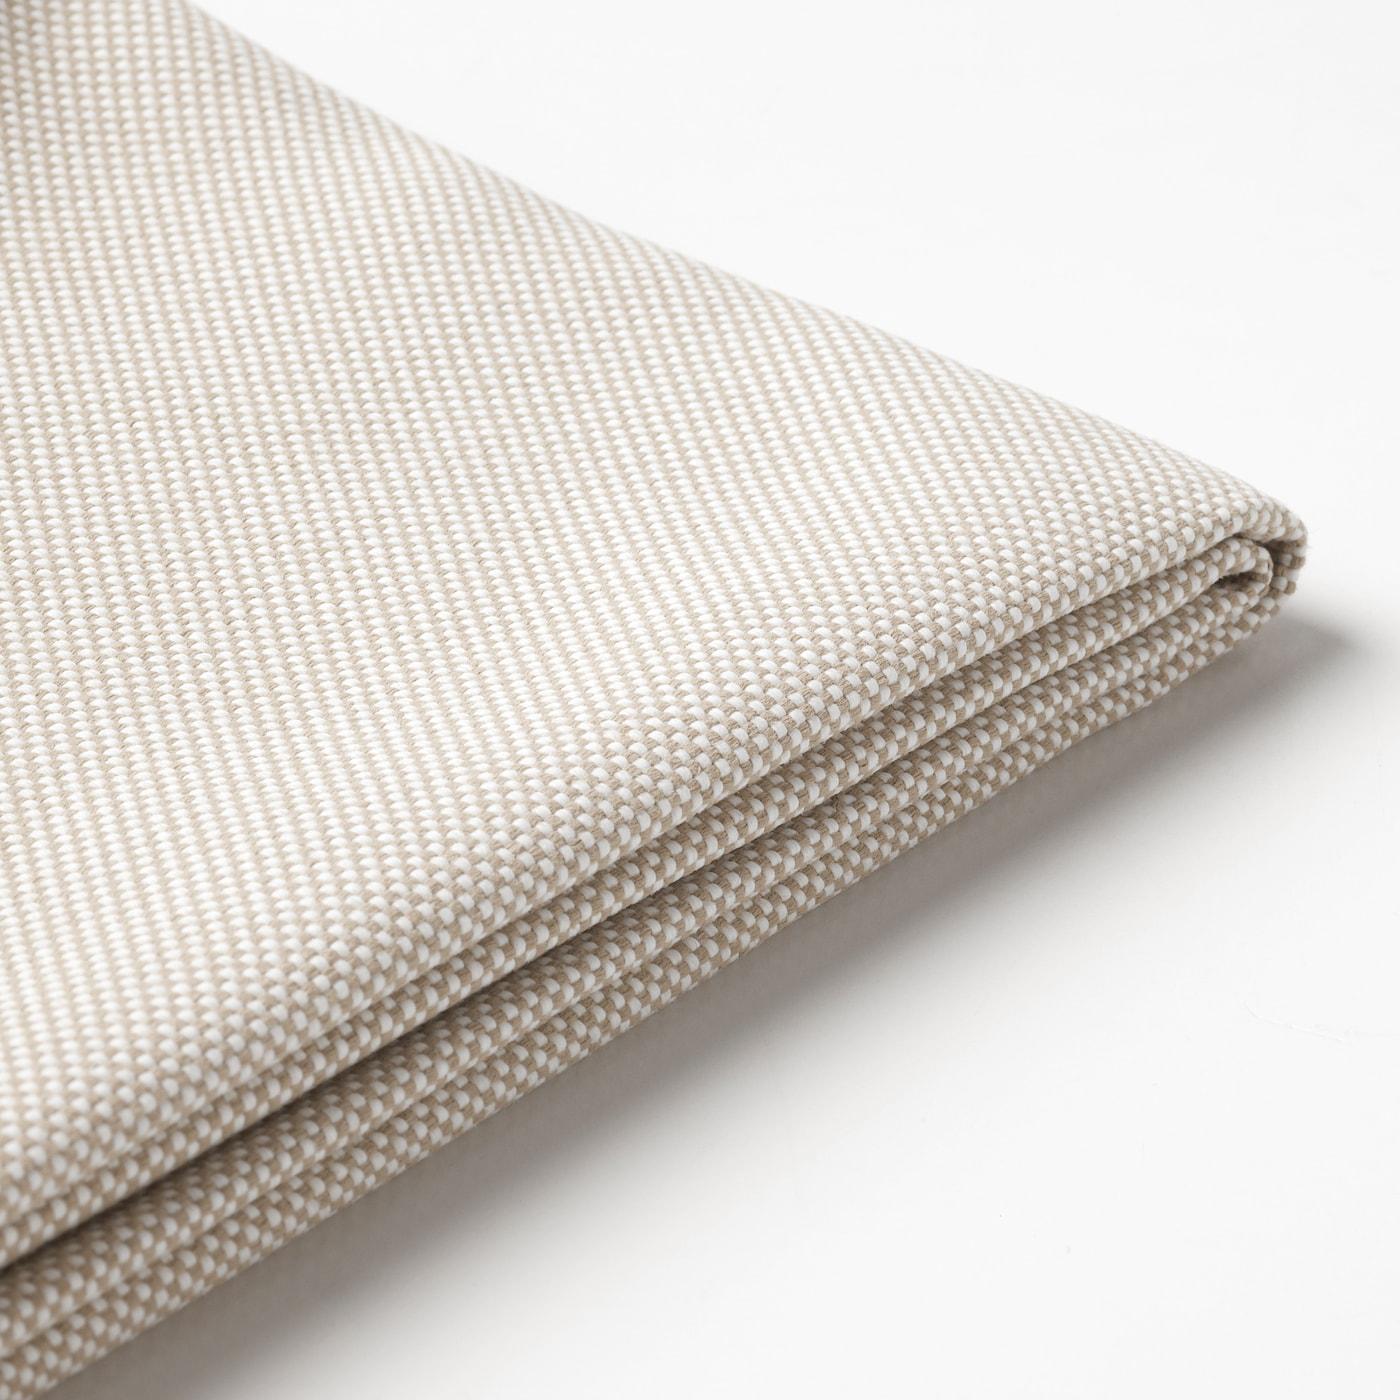 FRÖSÖN Cover for seat/back cushion, outdoor beige, 116x45 cm